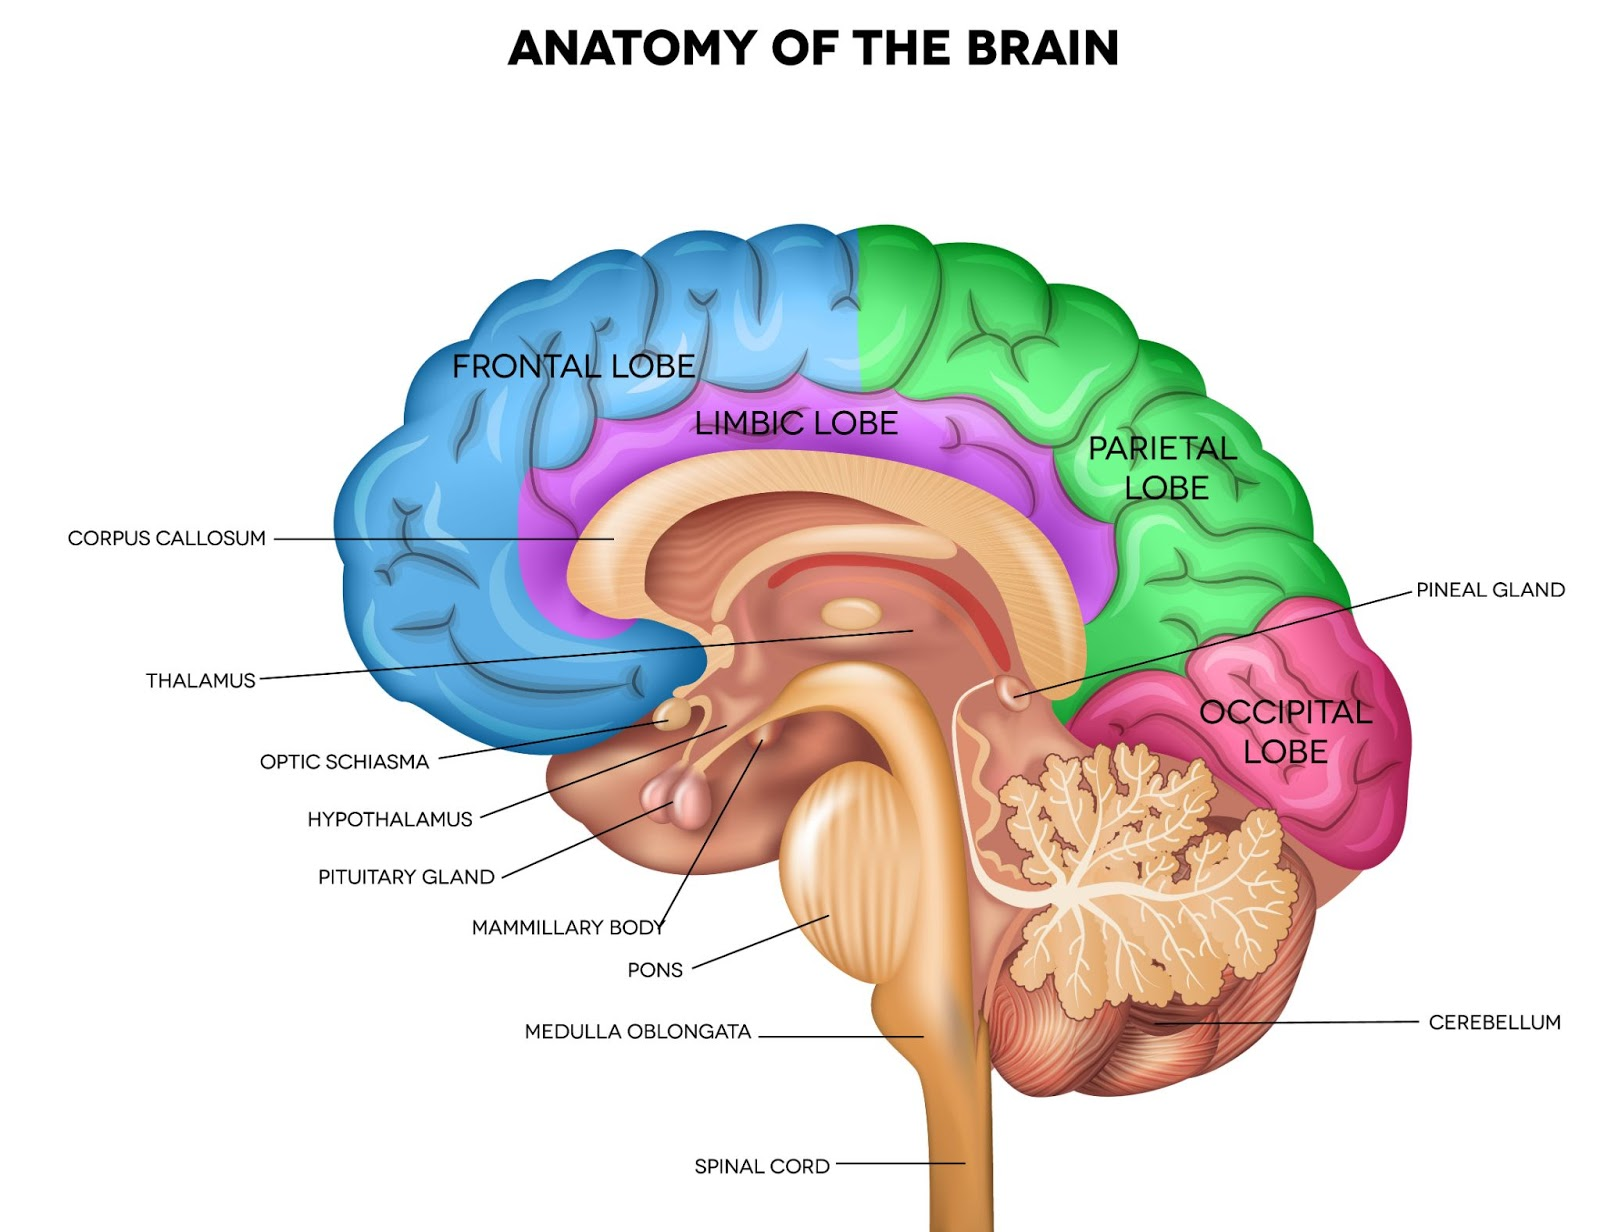 Sleep inertia: Anatomy of the brain